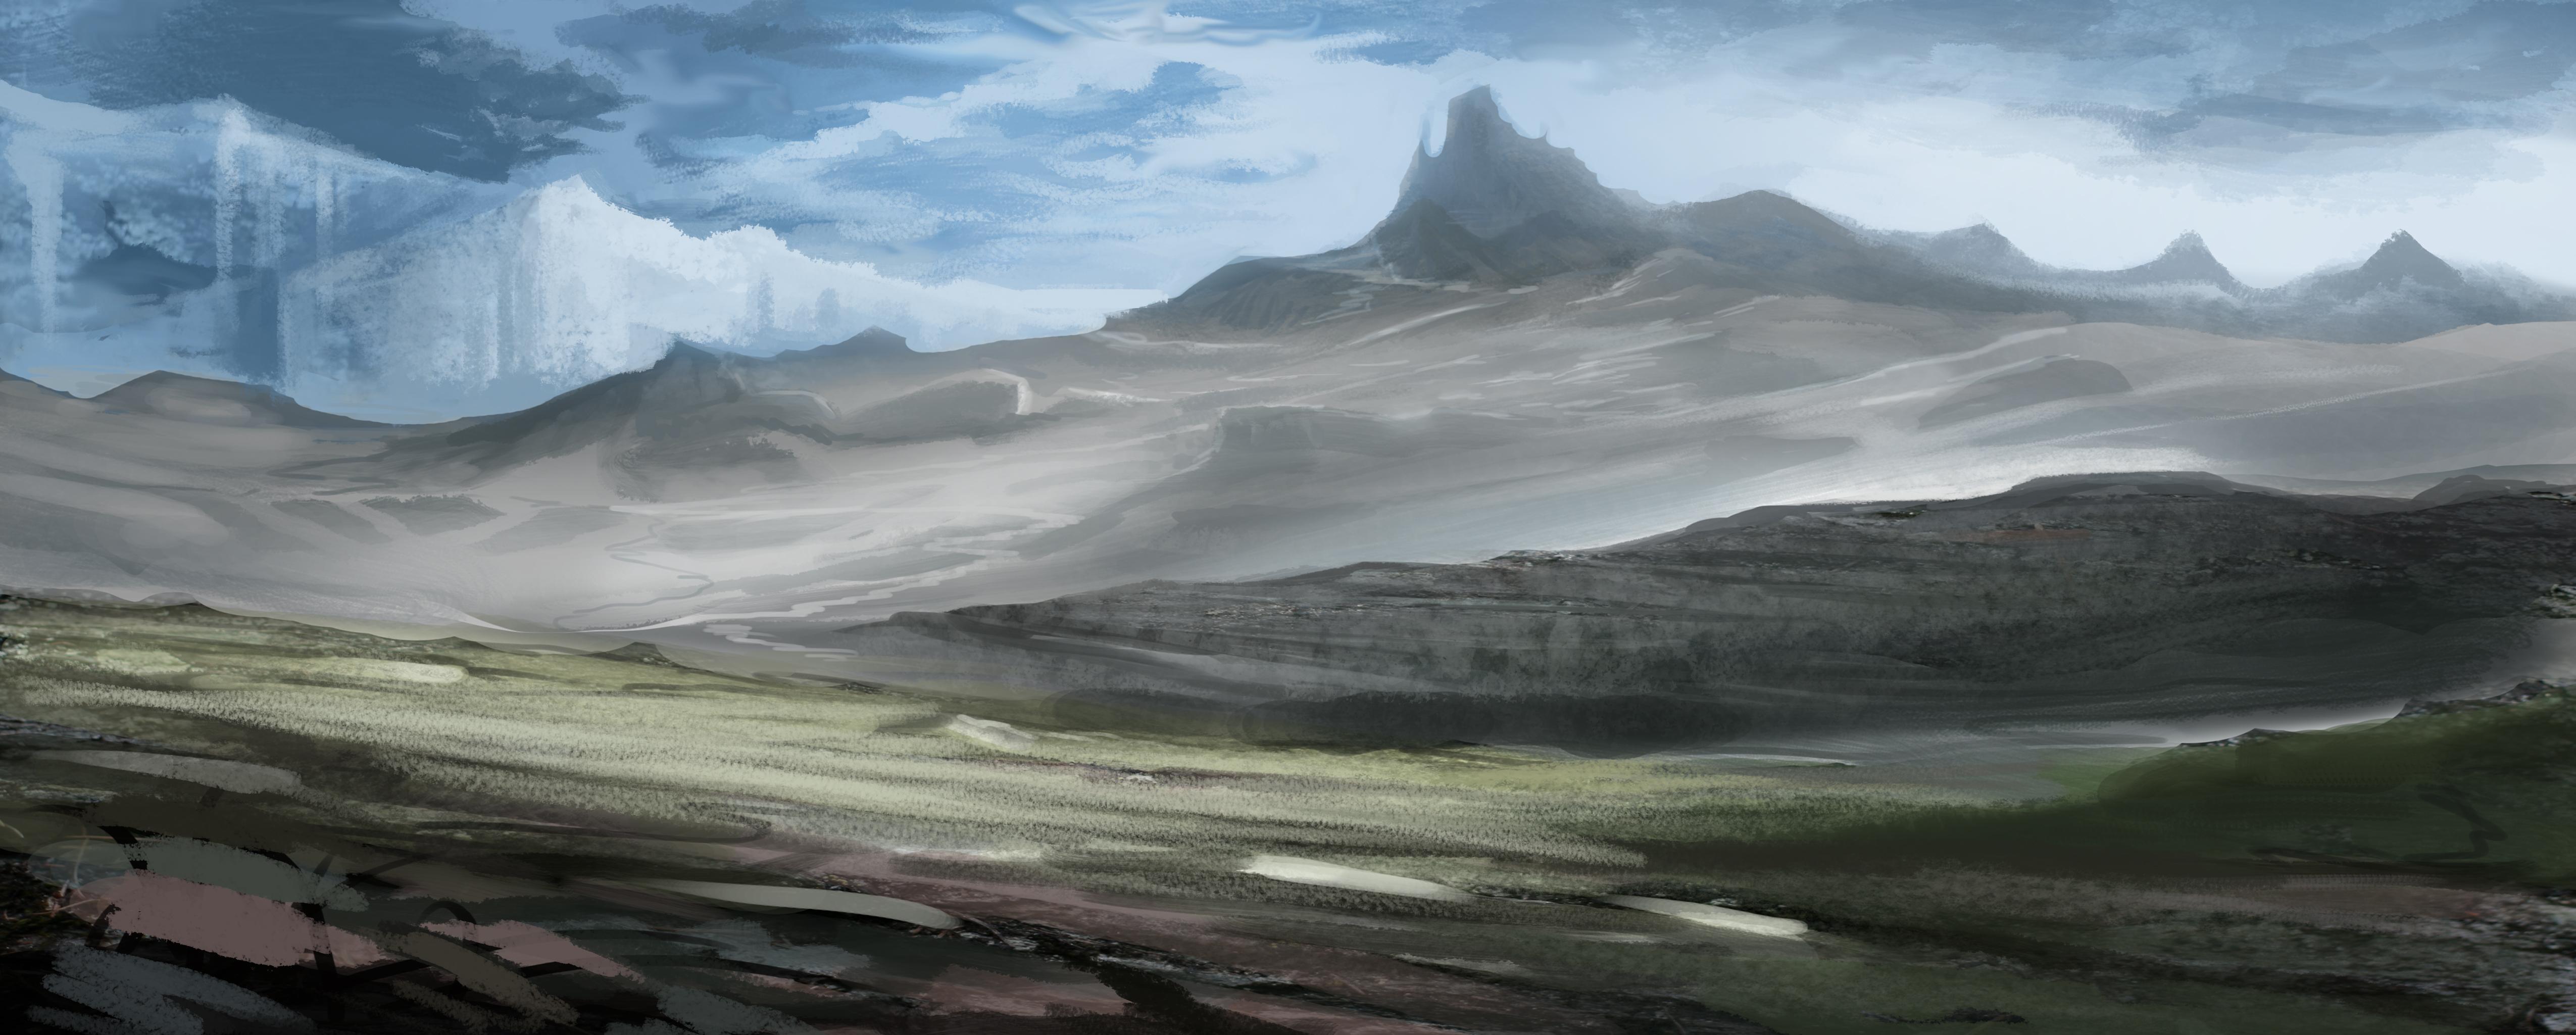 Tundra by Shane-D-Solomon